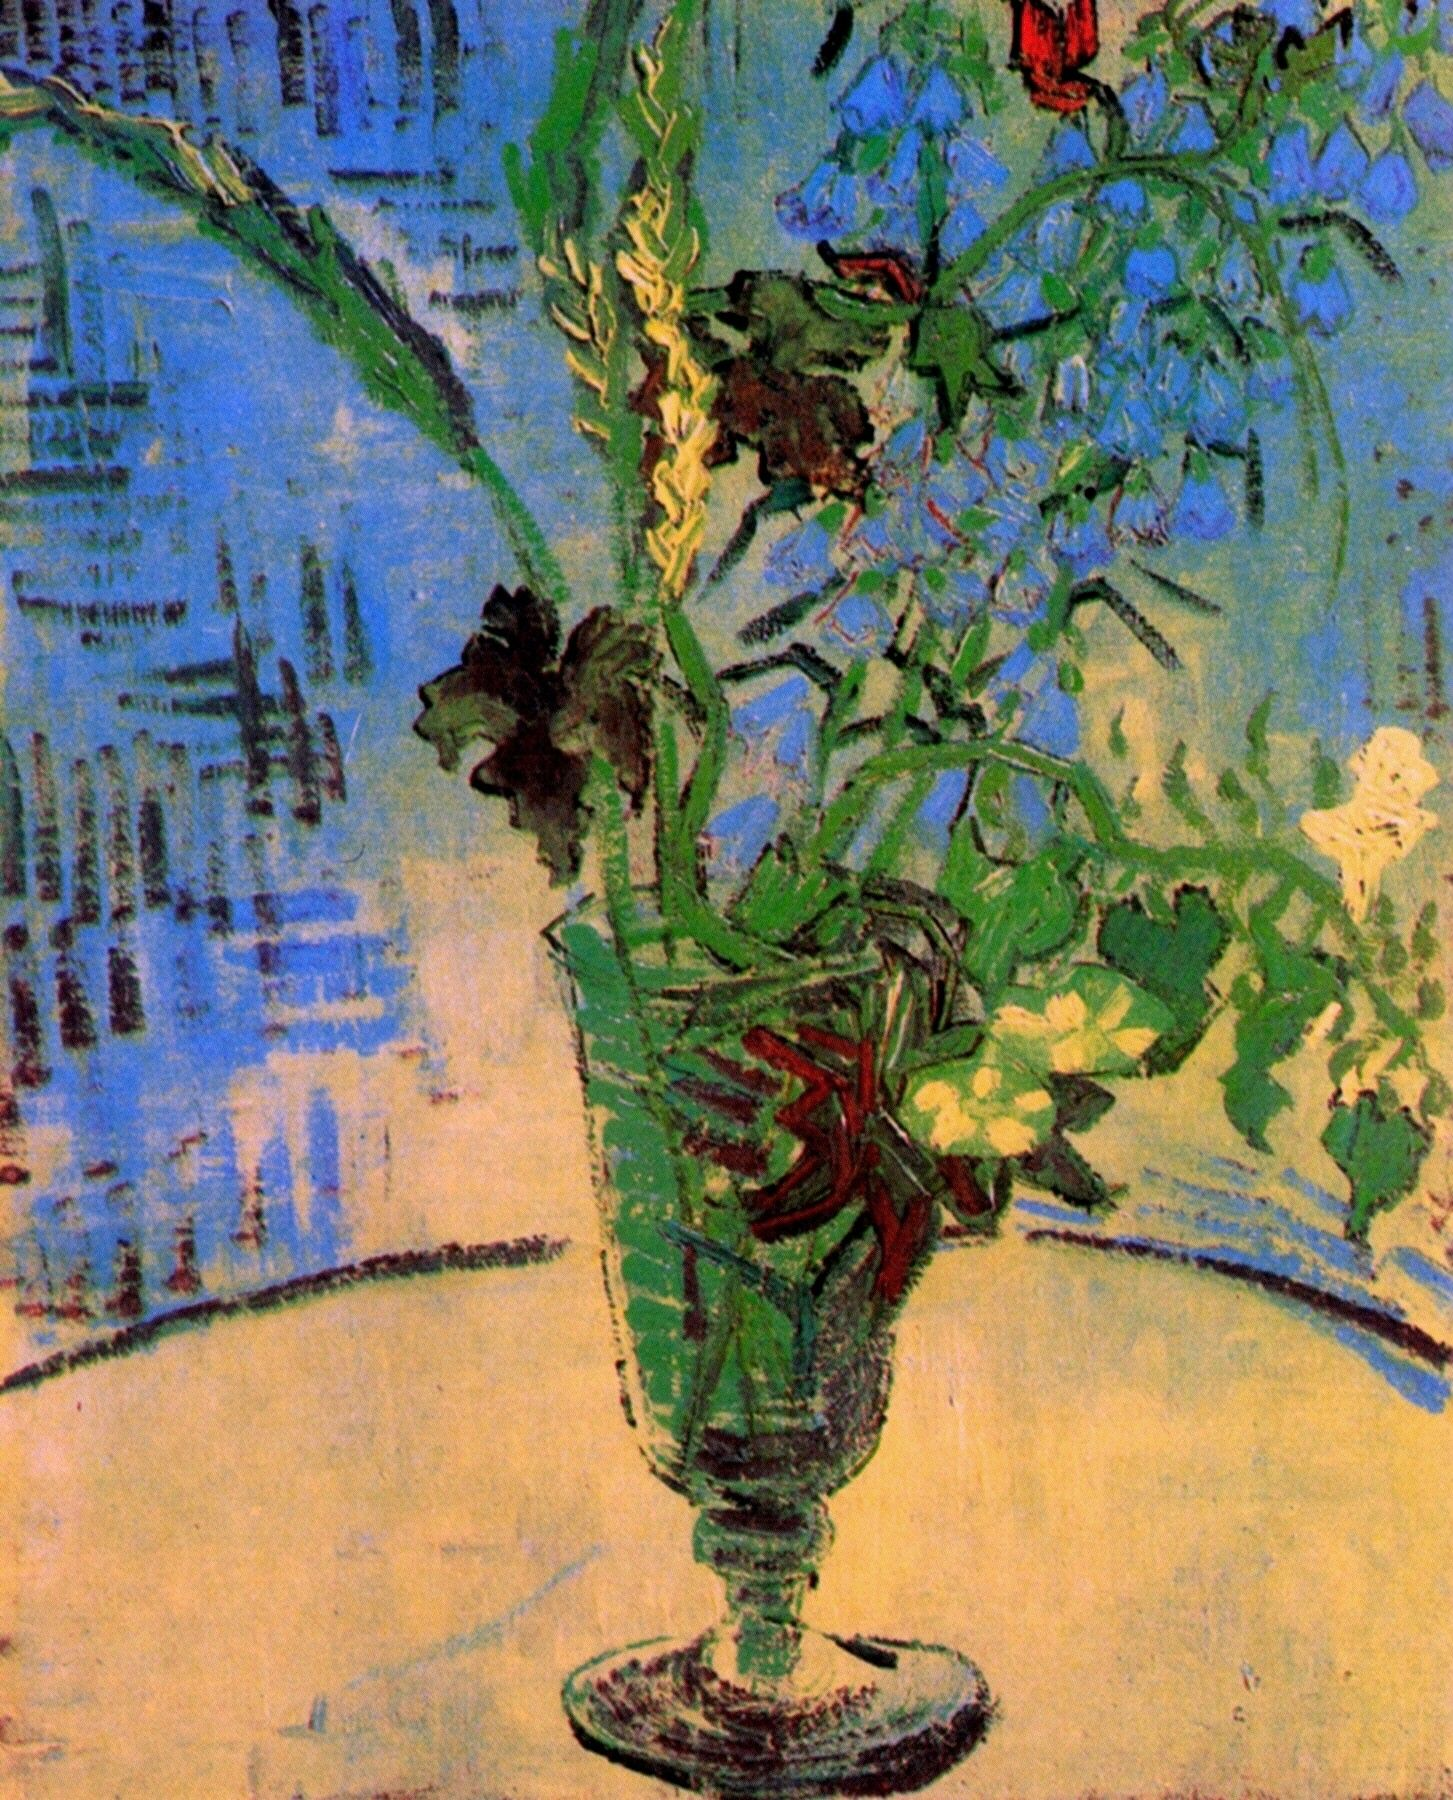 Still Life Glass w Wild Flowers by Vincent van Gogh 30 Mar 1853 – 29 Jul 18